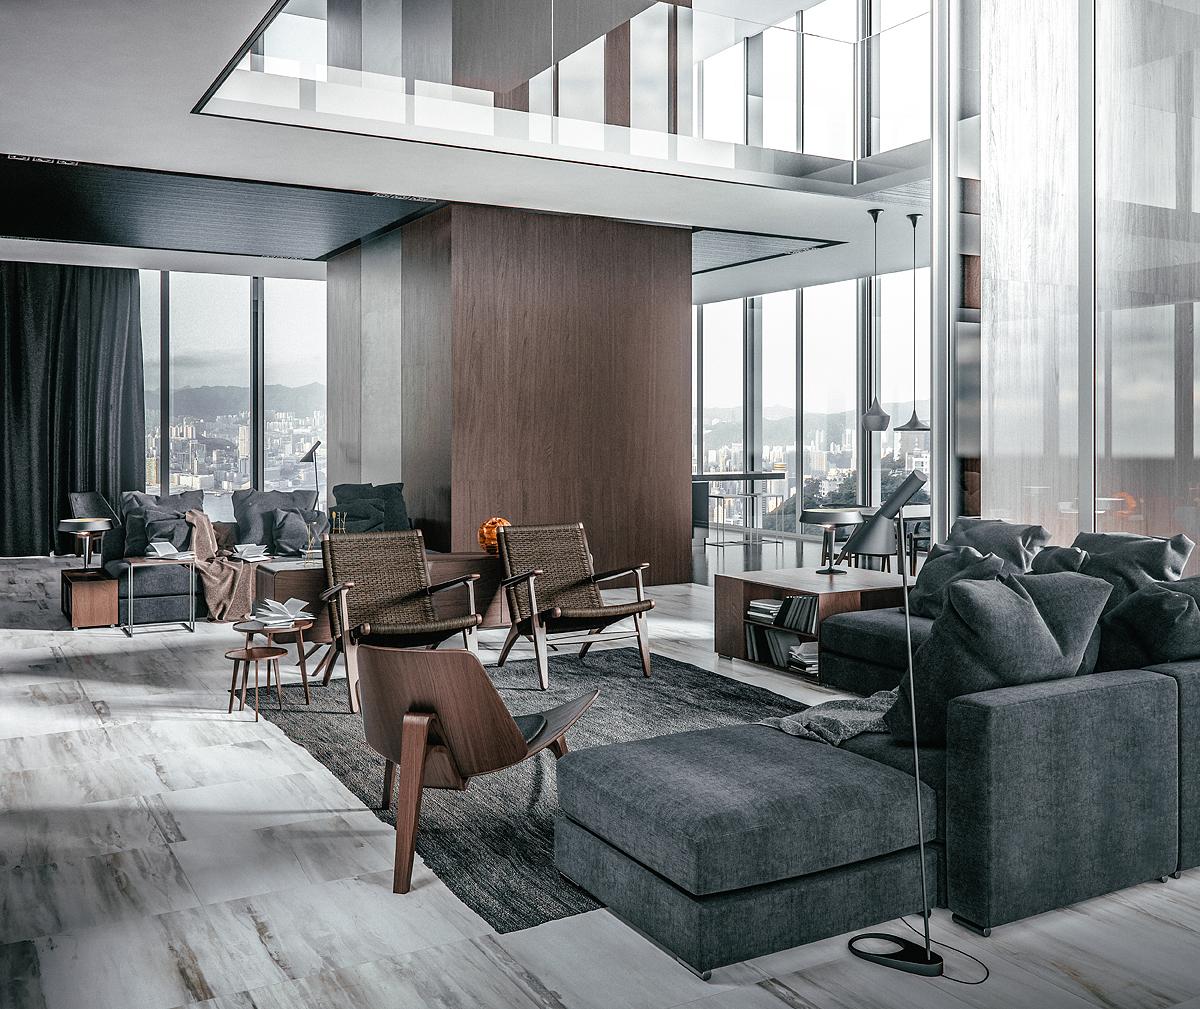 Alexandremiraldo luxury living 07 1 d3f89c3b am6n